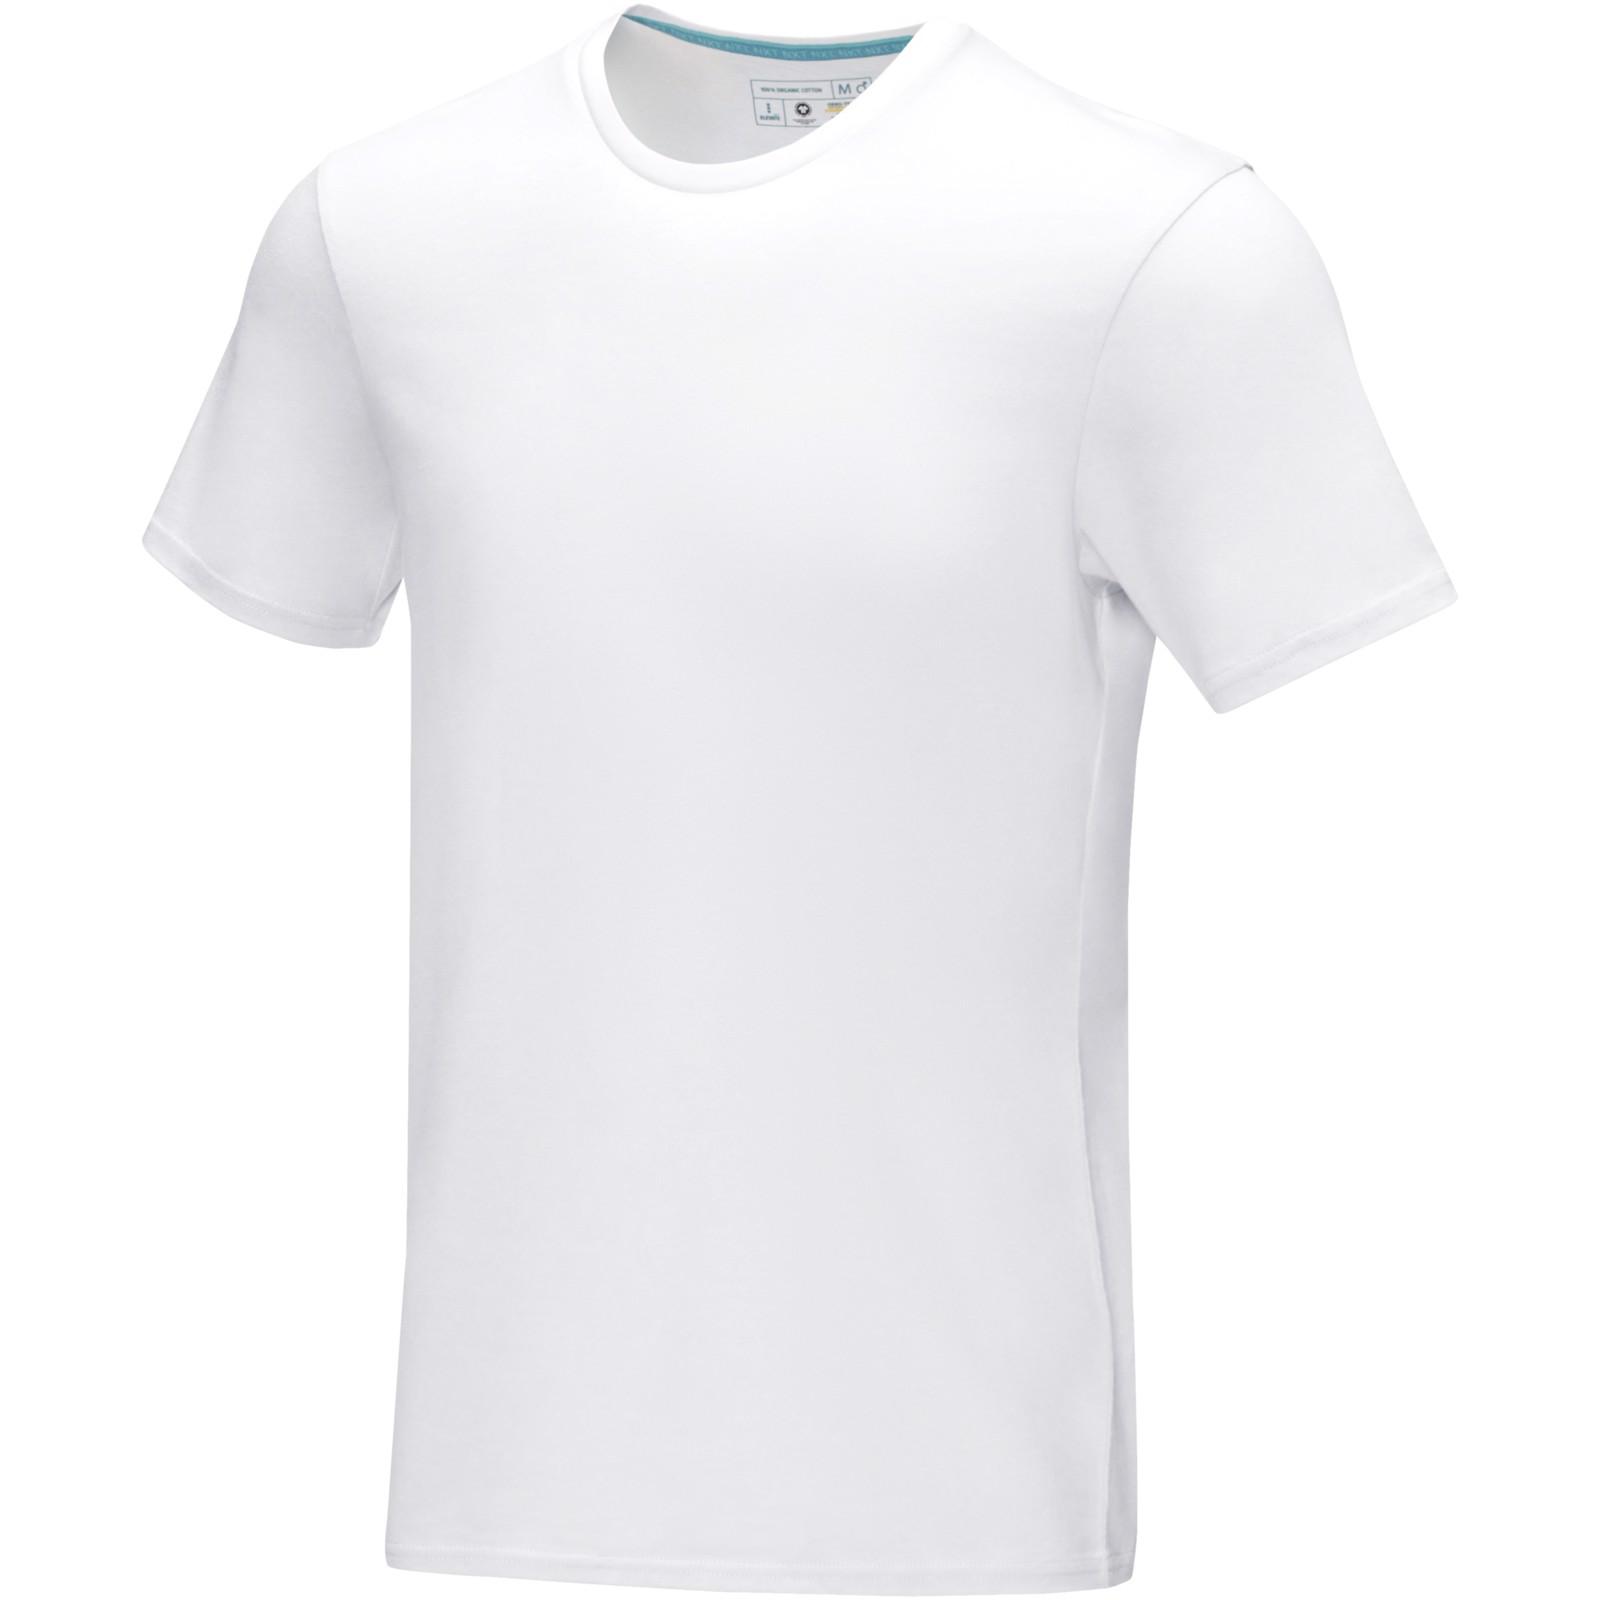 "Camiseta orgánica GOTS de manga corta para hombre ""Azurite"" - Blanco / XS"